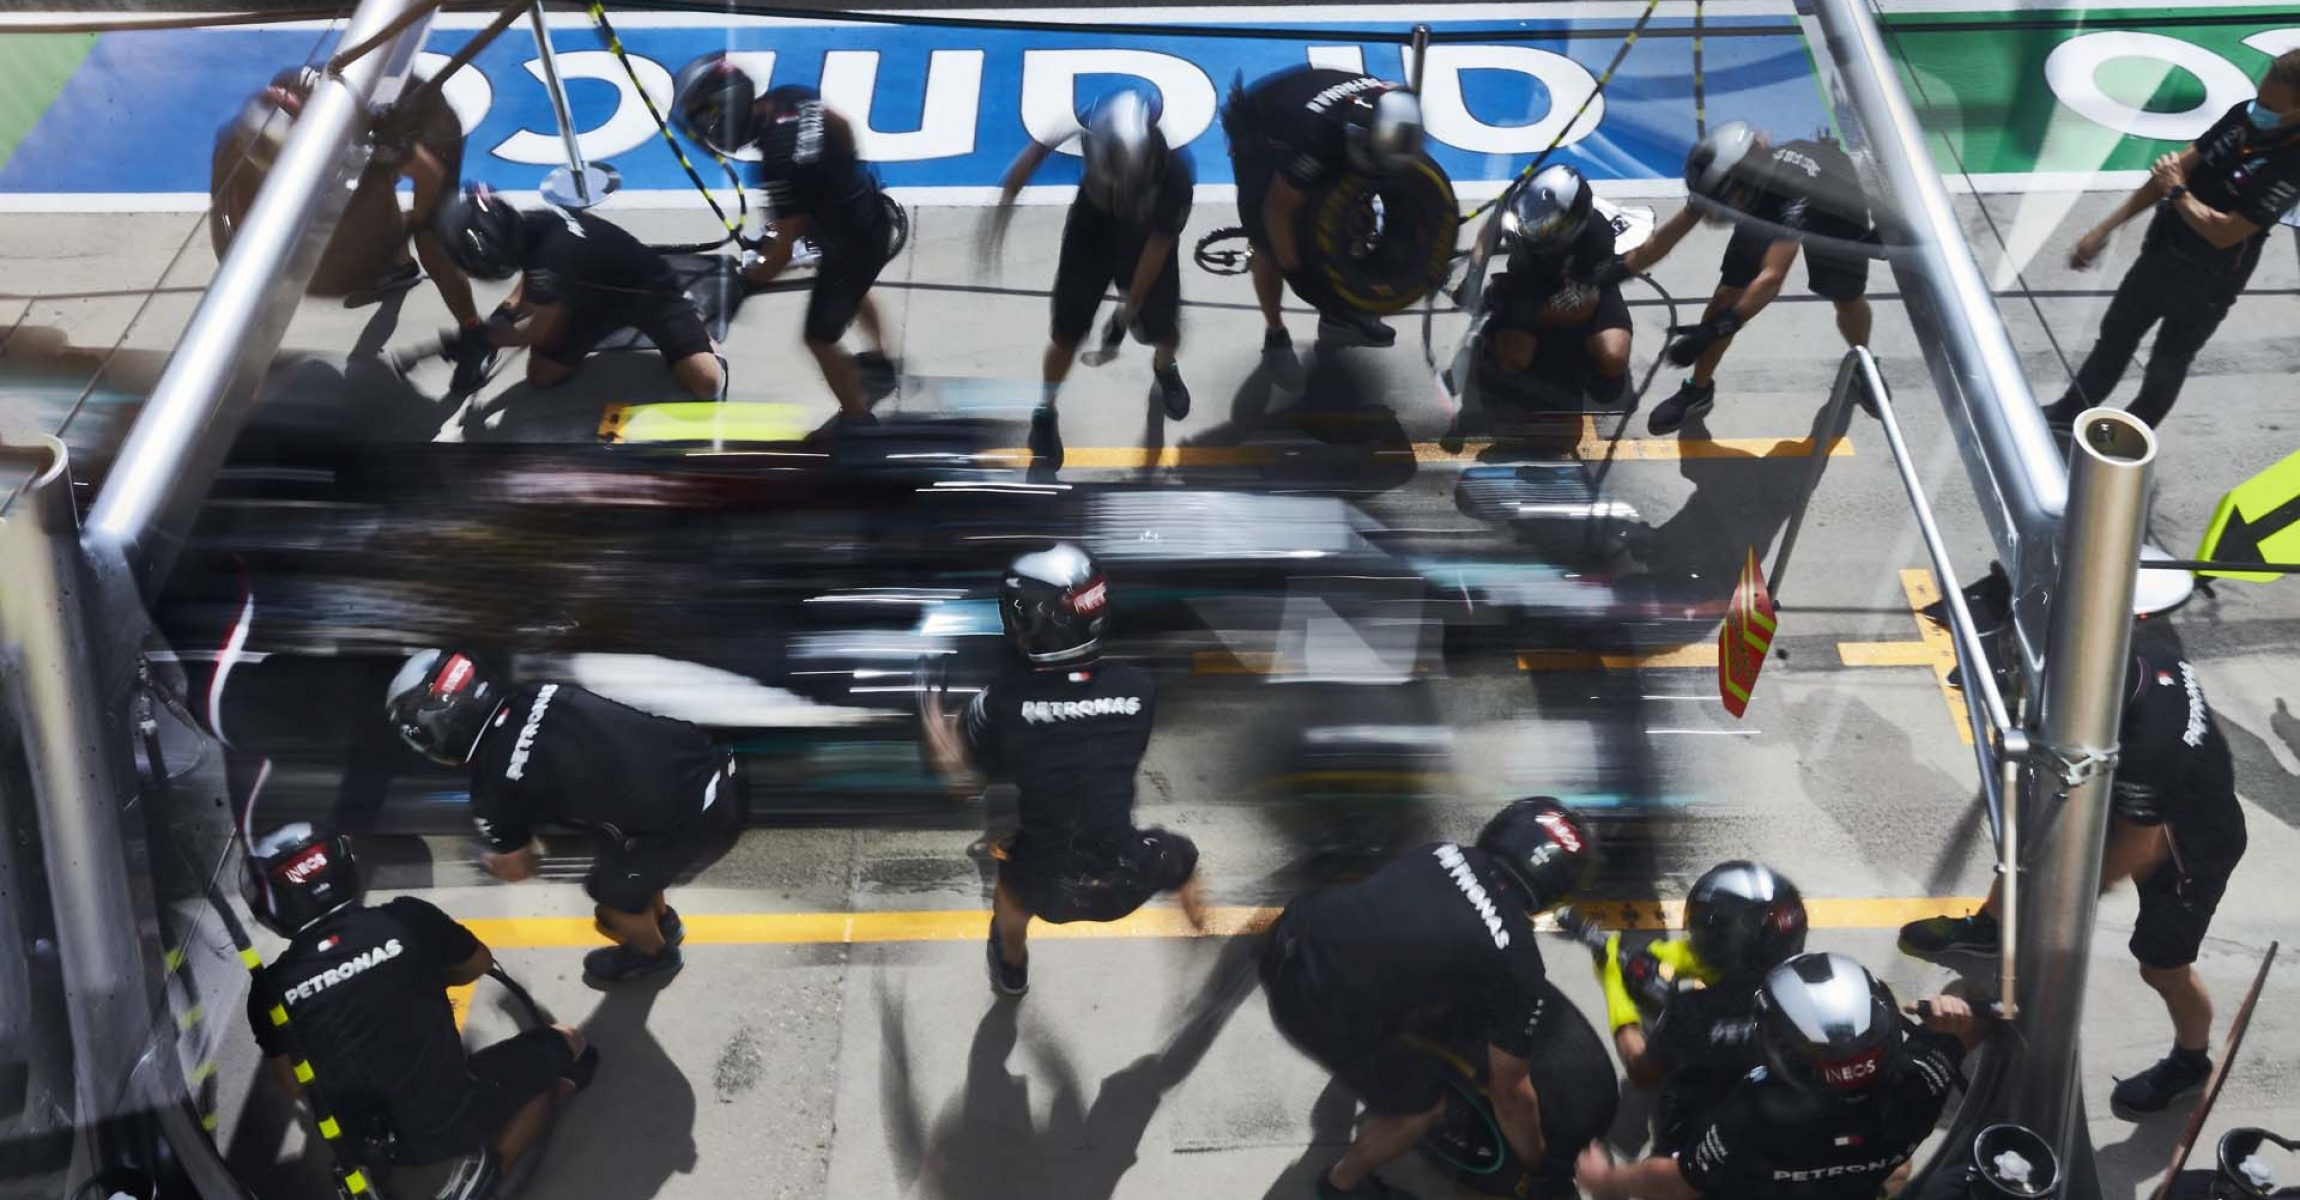 2020 Hungarian Grand Prix, Thursday - Steve Etherington Mercedes pitstop